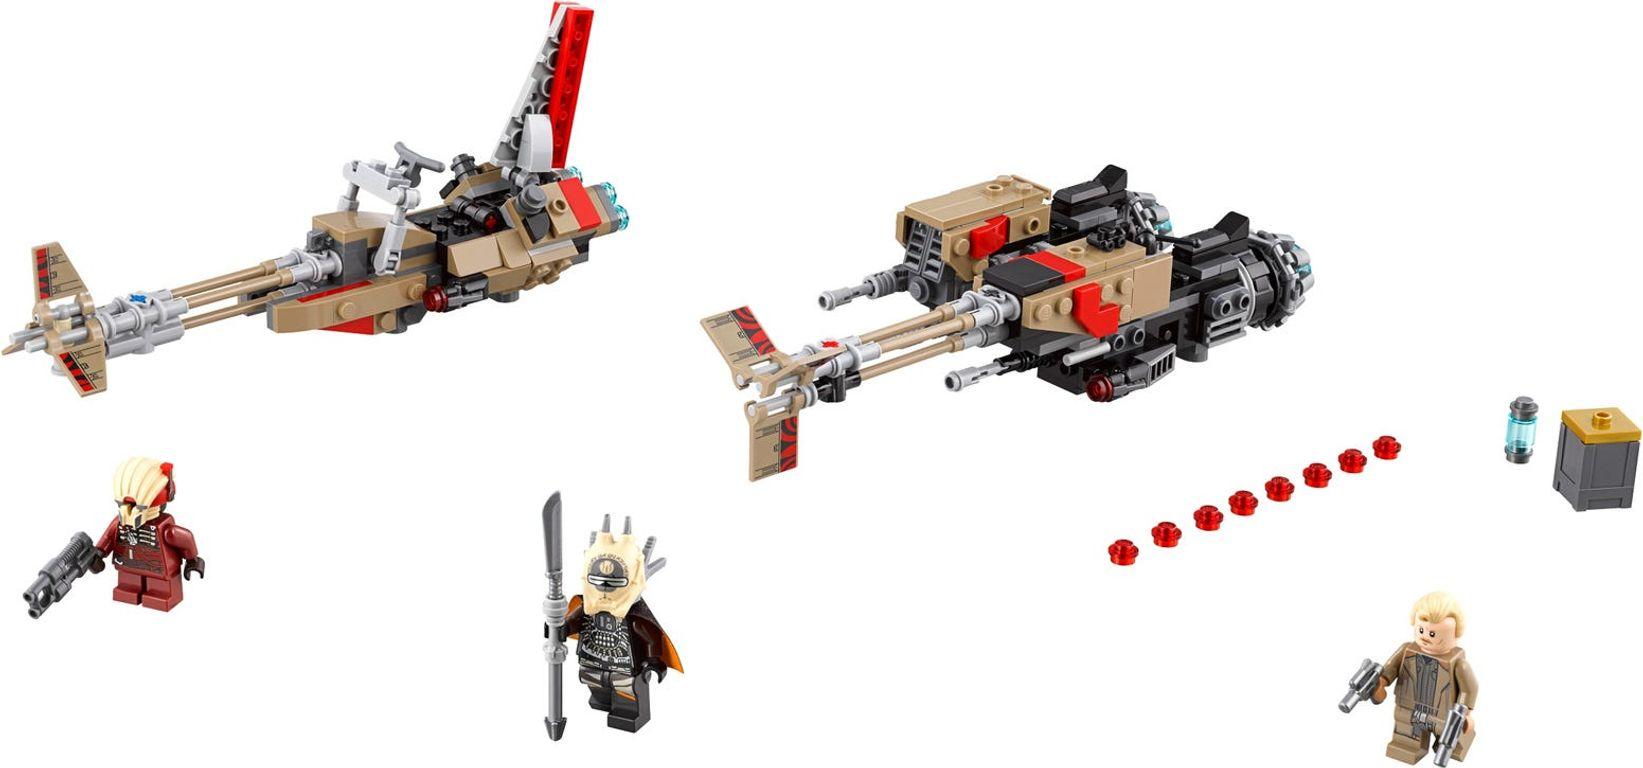 LEGO® Star Wars Cloud-Rider Swoop Bikes™ components